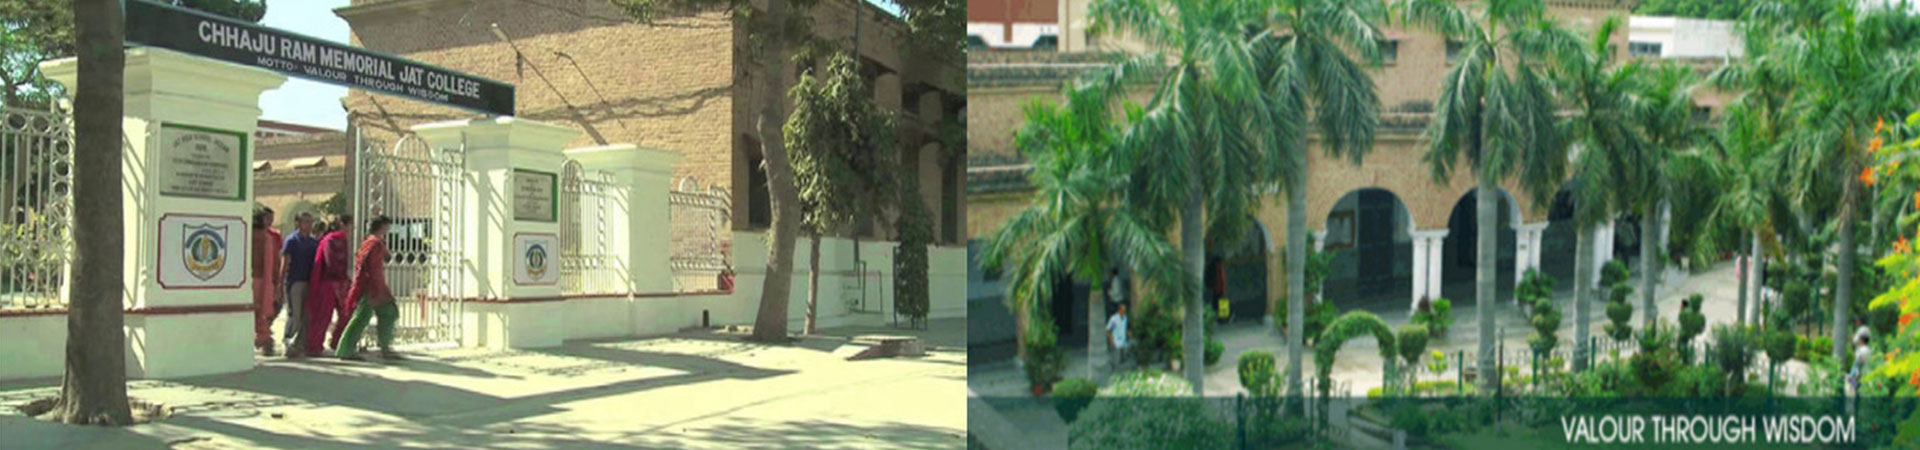 Welcome to Chhaju Ram Memorial Jat College